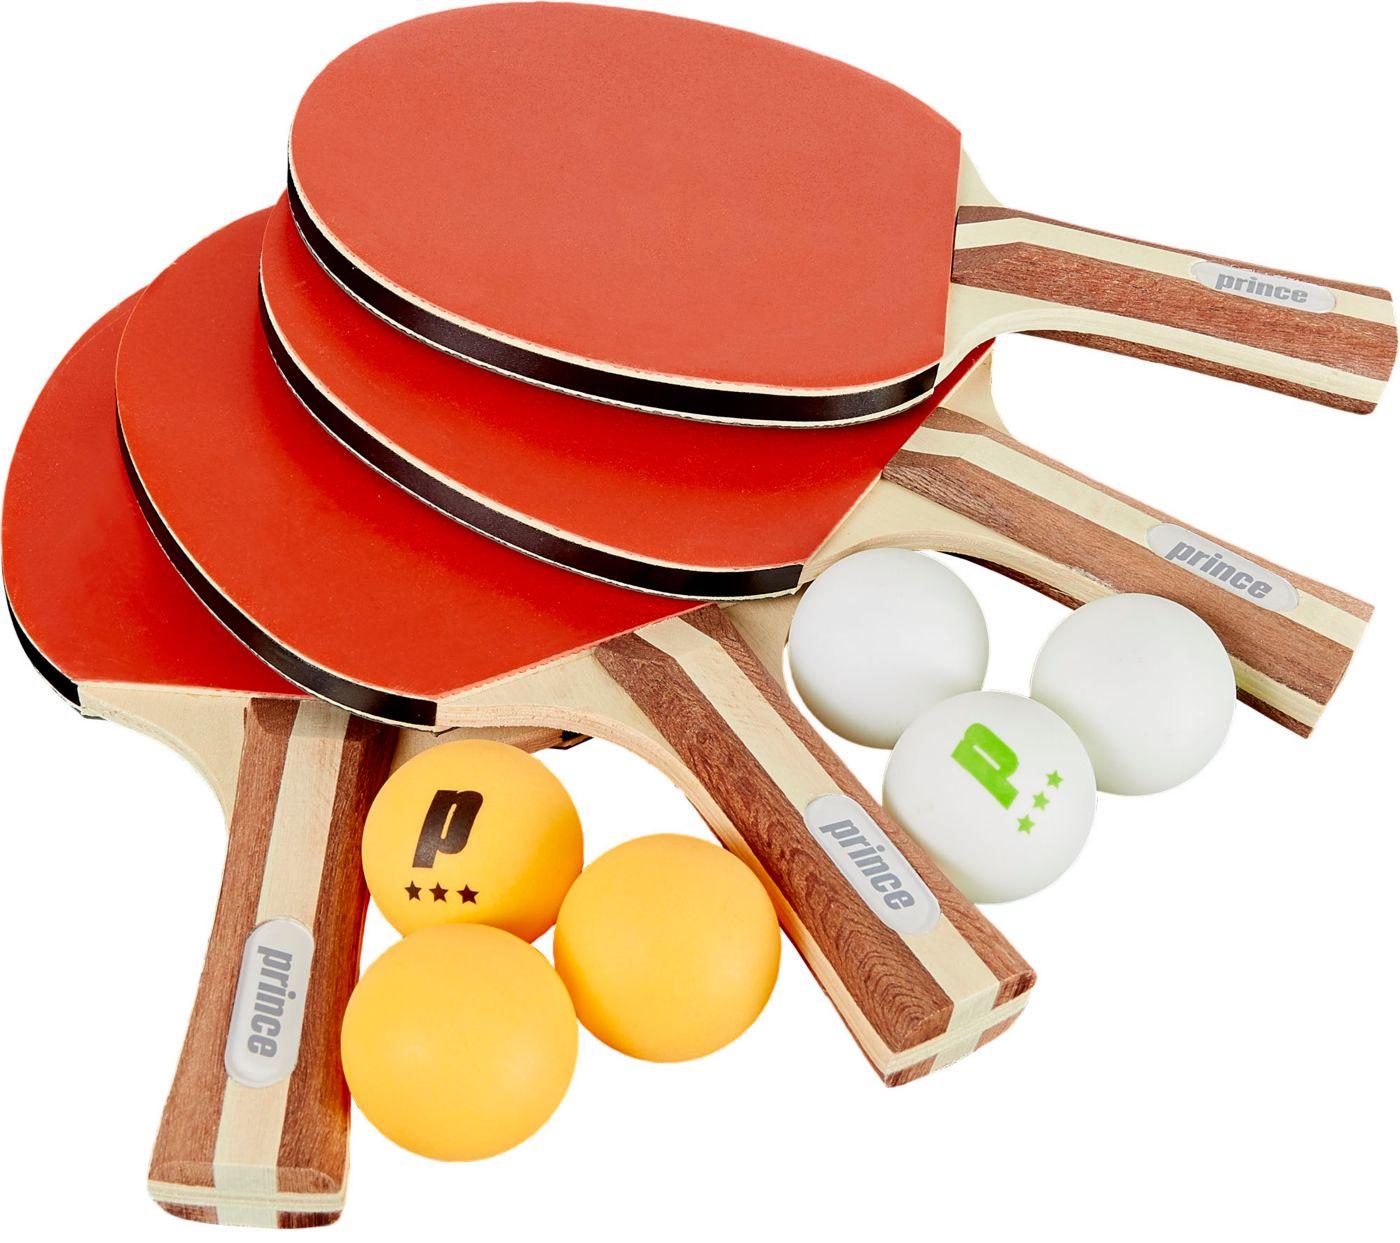 Prince Premium 4-Player Racket Set